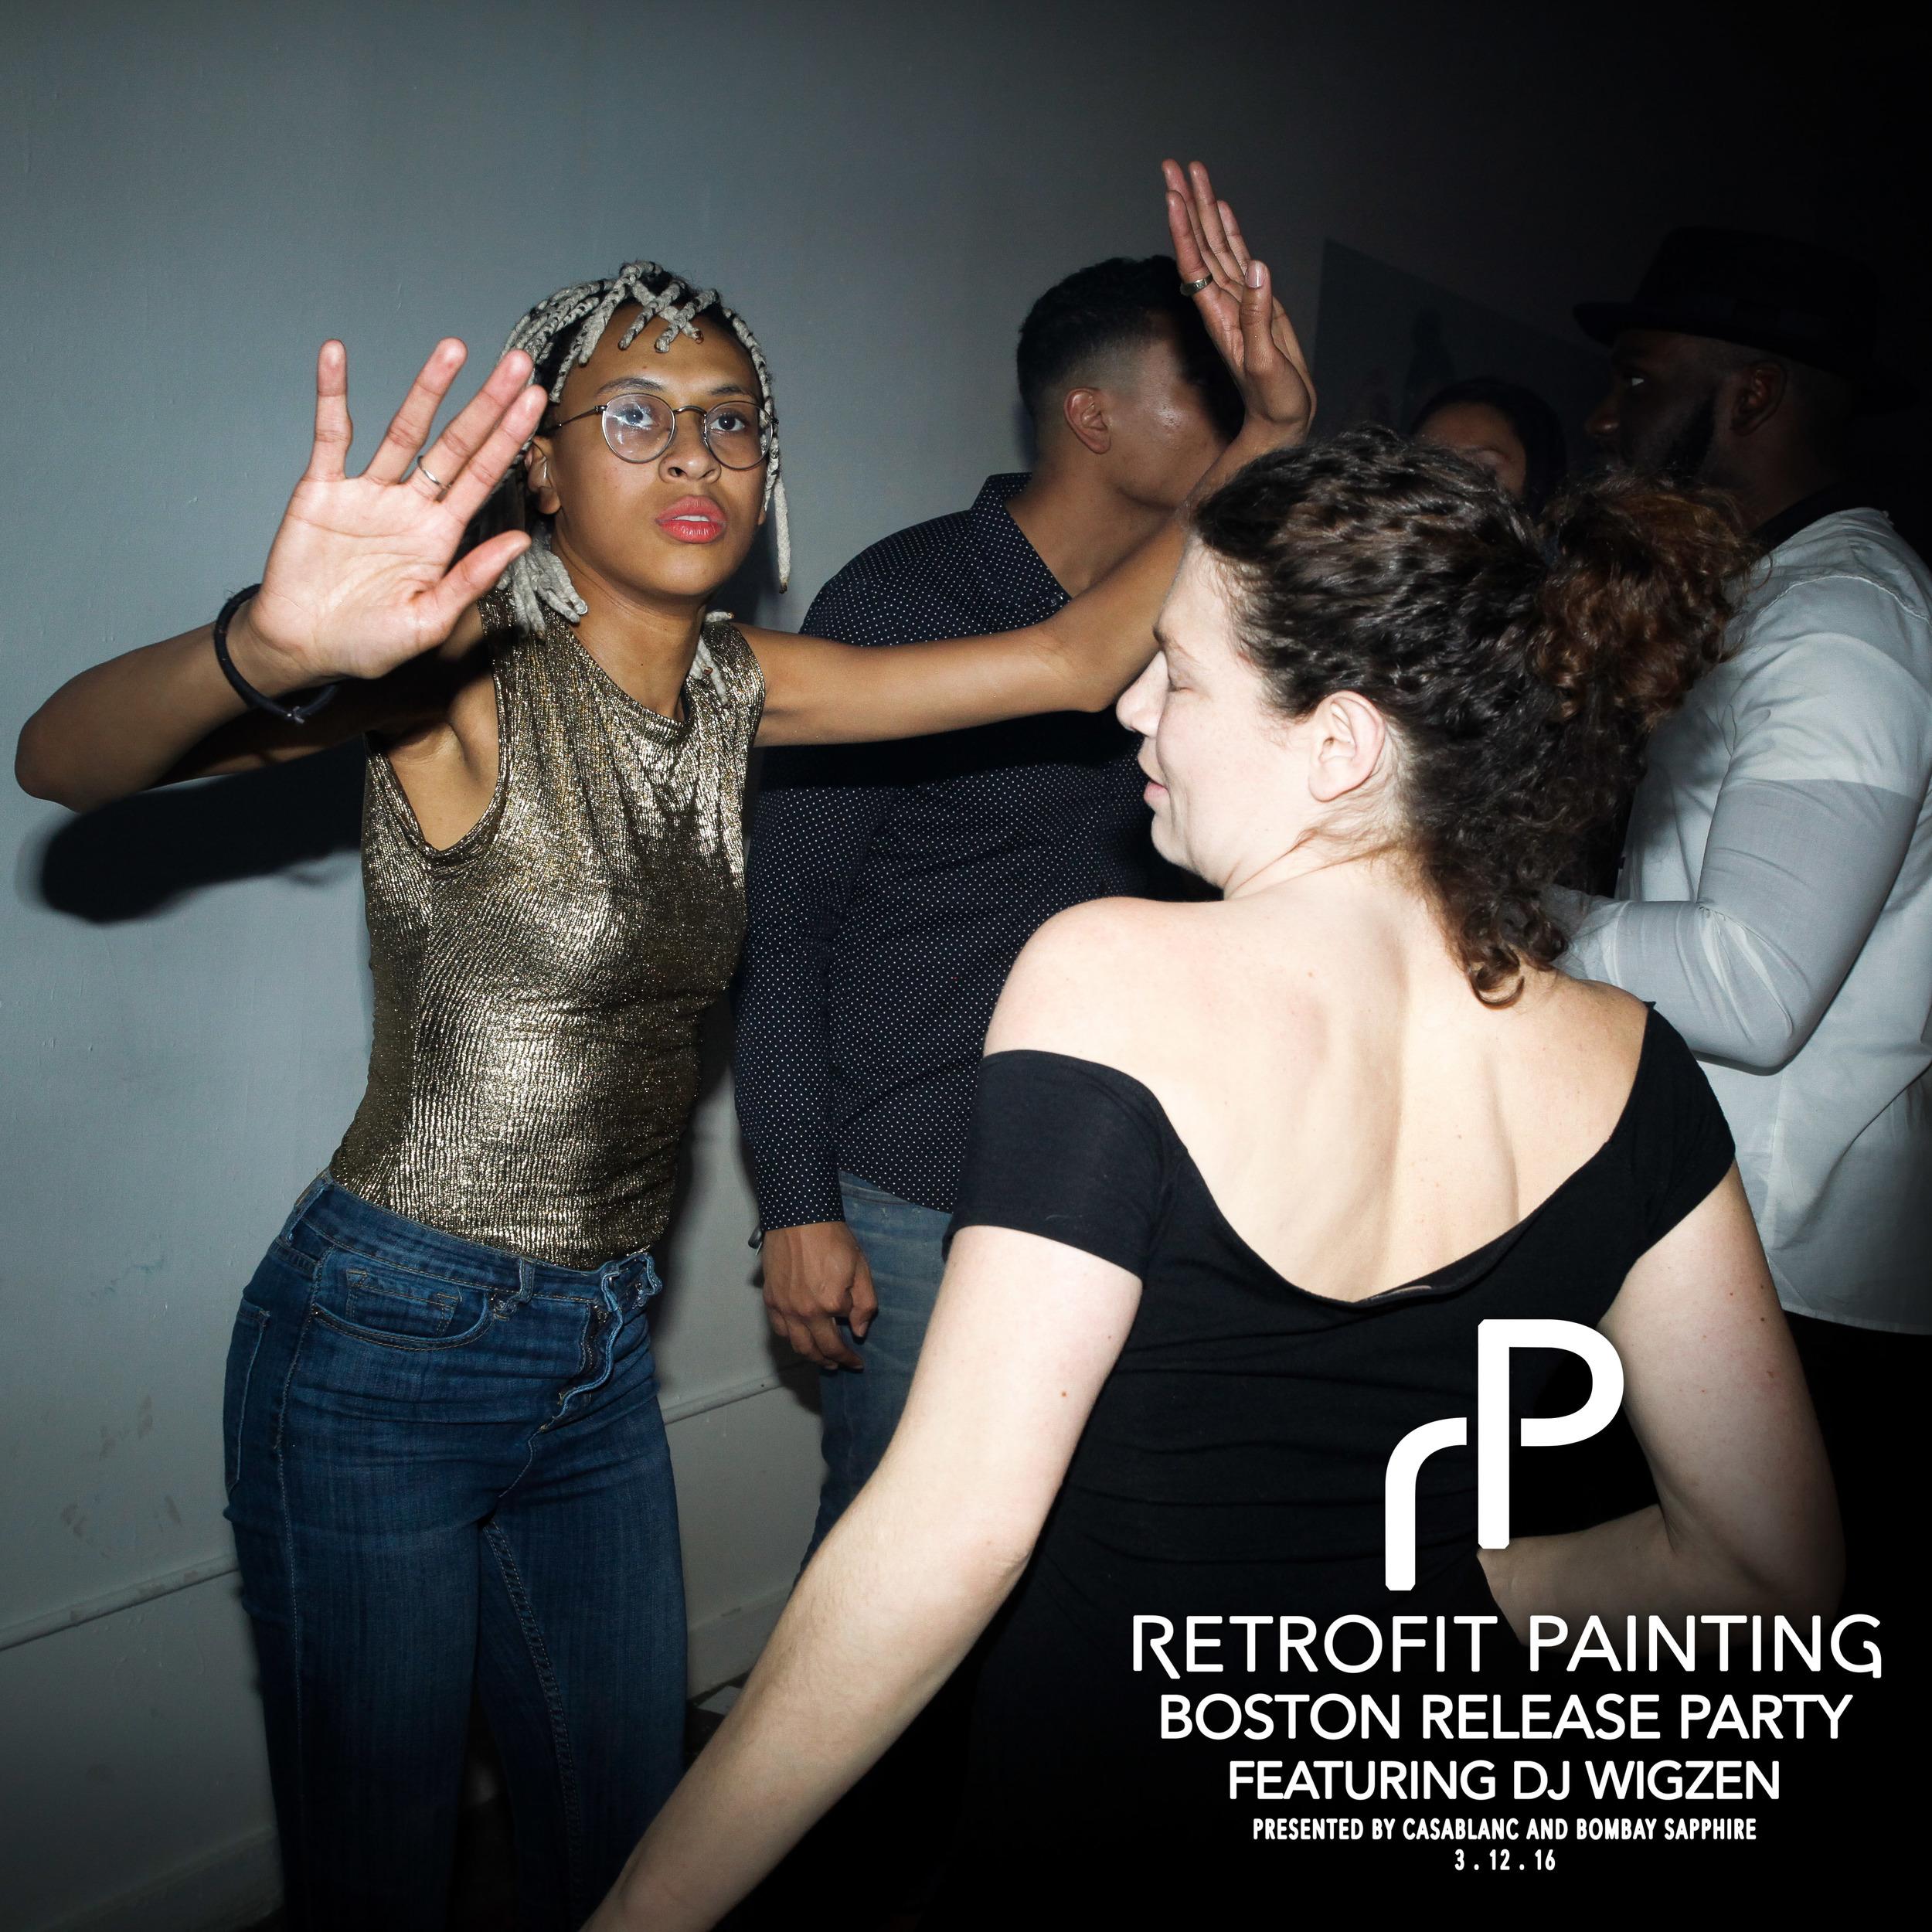 Retrofit Painting Boston Release Party 0153.jpg